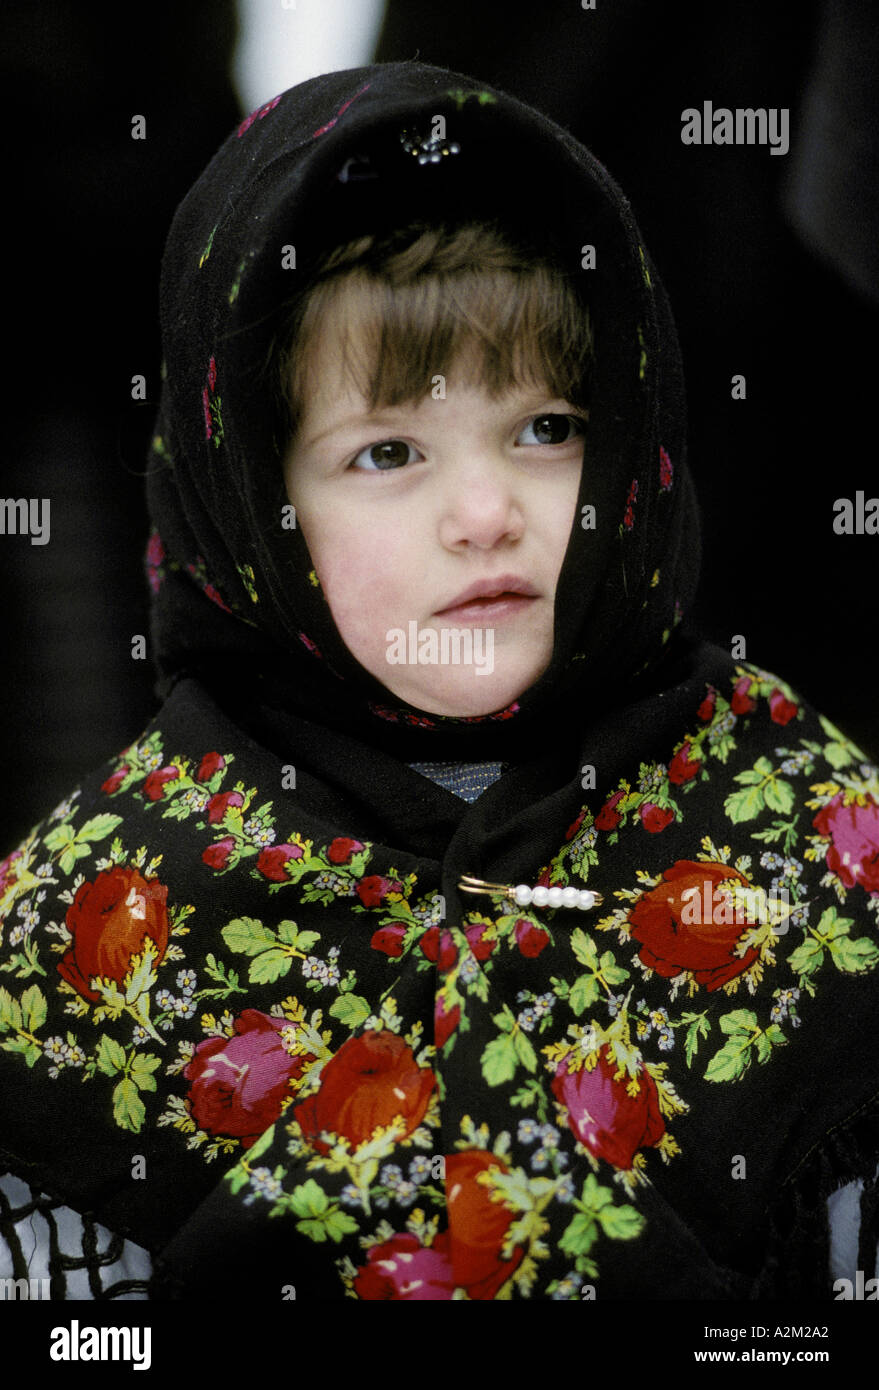 Child - Stock Image